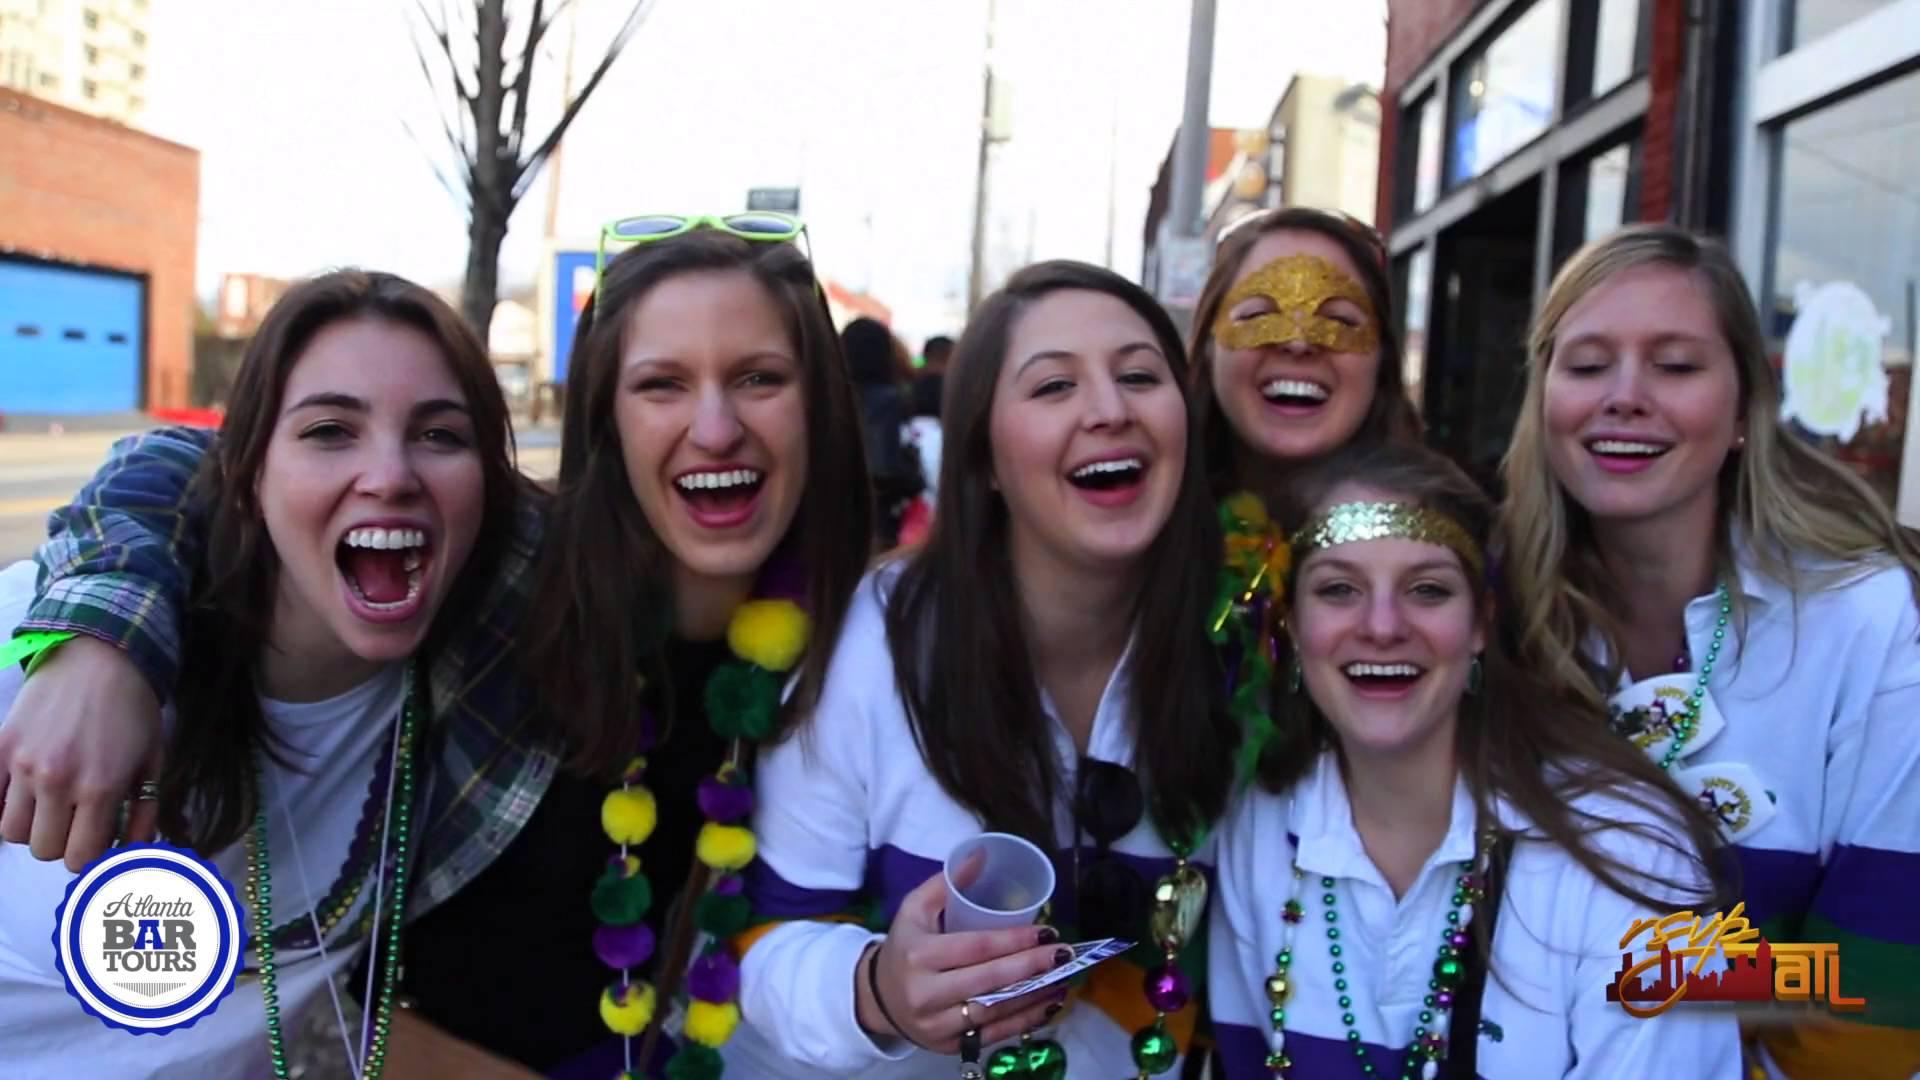 Best bars and restaurants to celebrate Mardi Gras in Atlanta